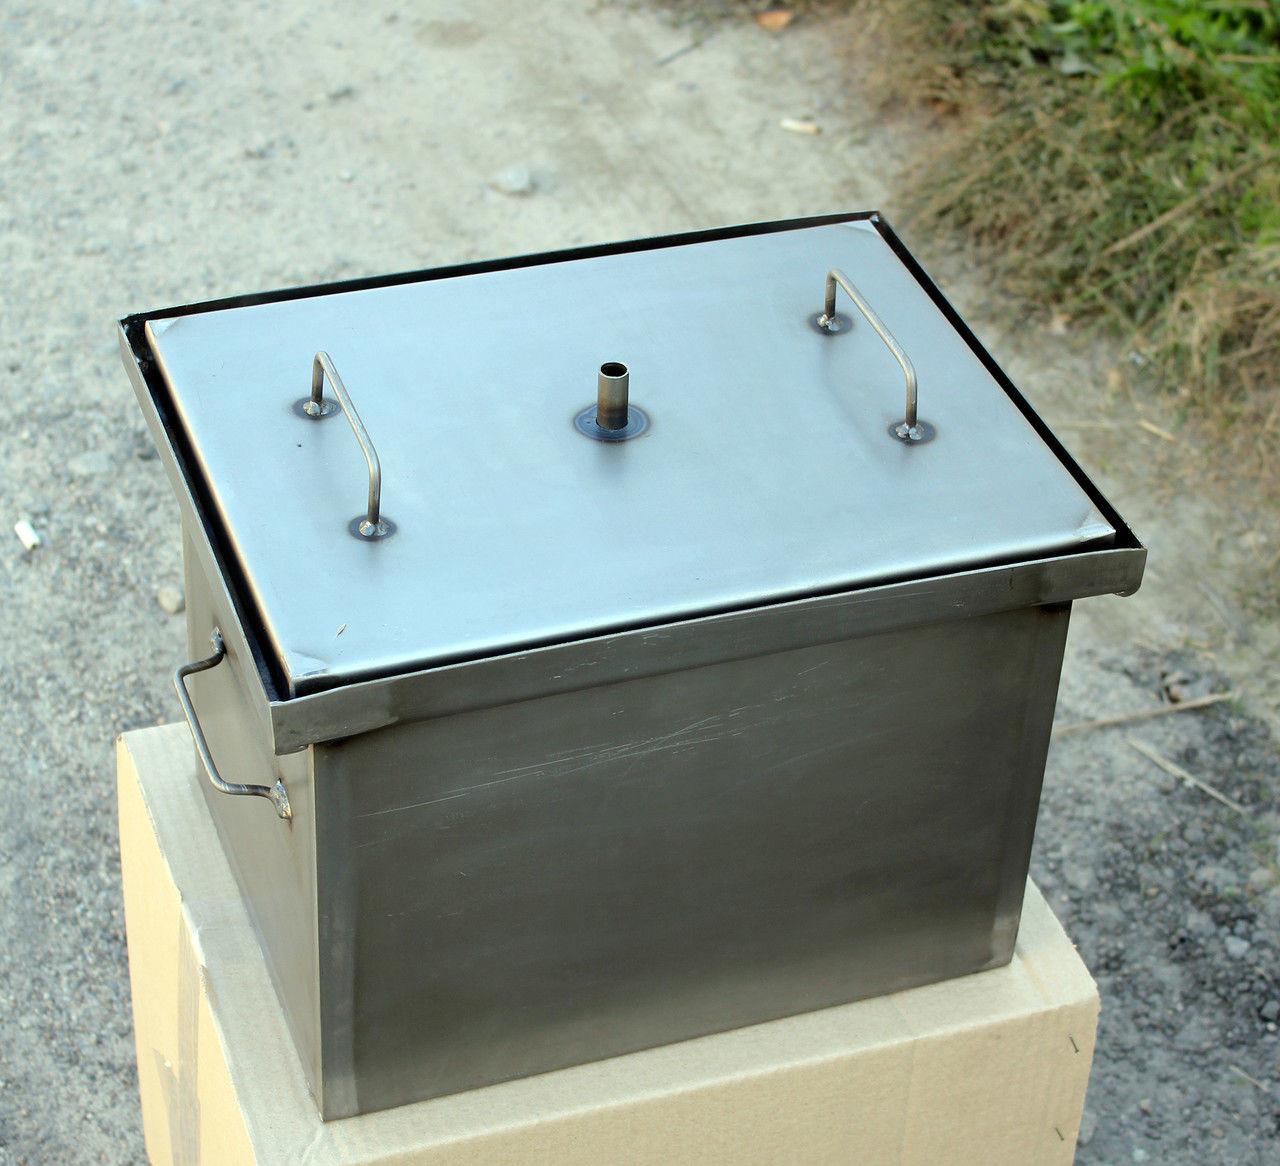 Коптильня горячего копчения с гидрозатвором (400х300х280) сталь, фото 1